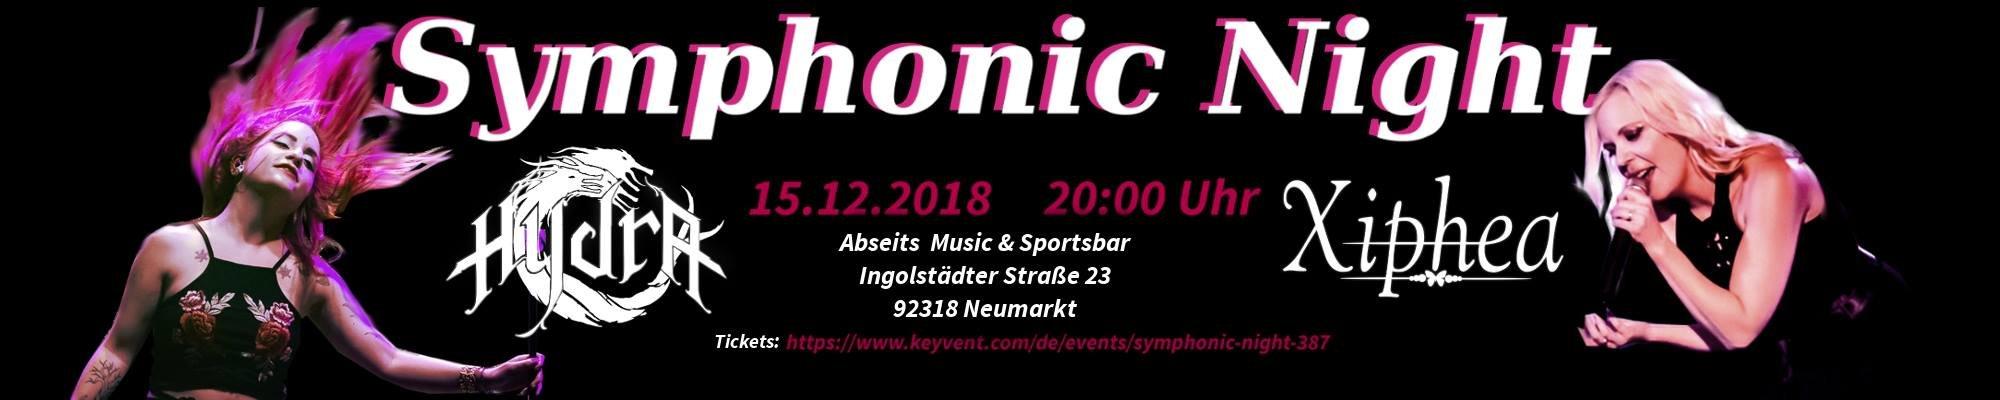 Symphonic Night Neumarkt